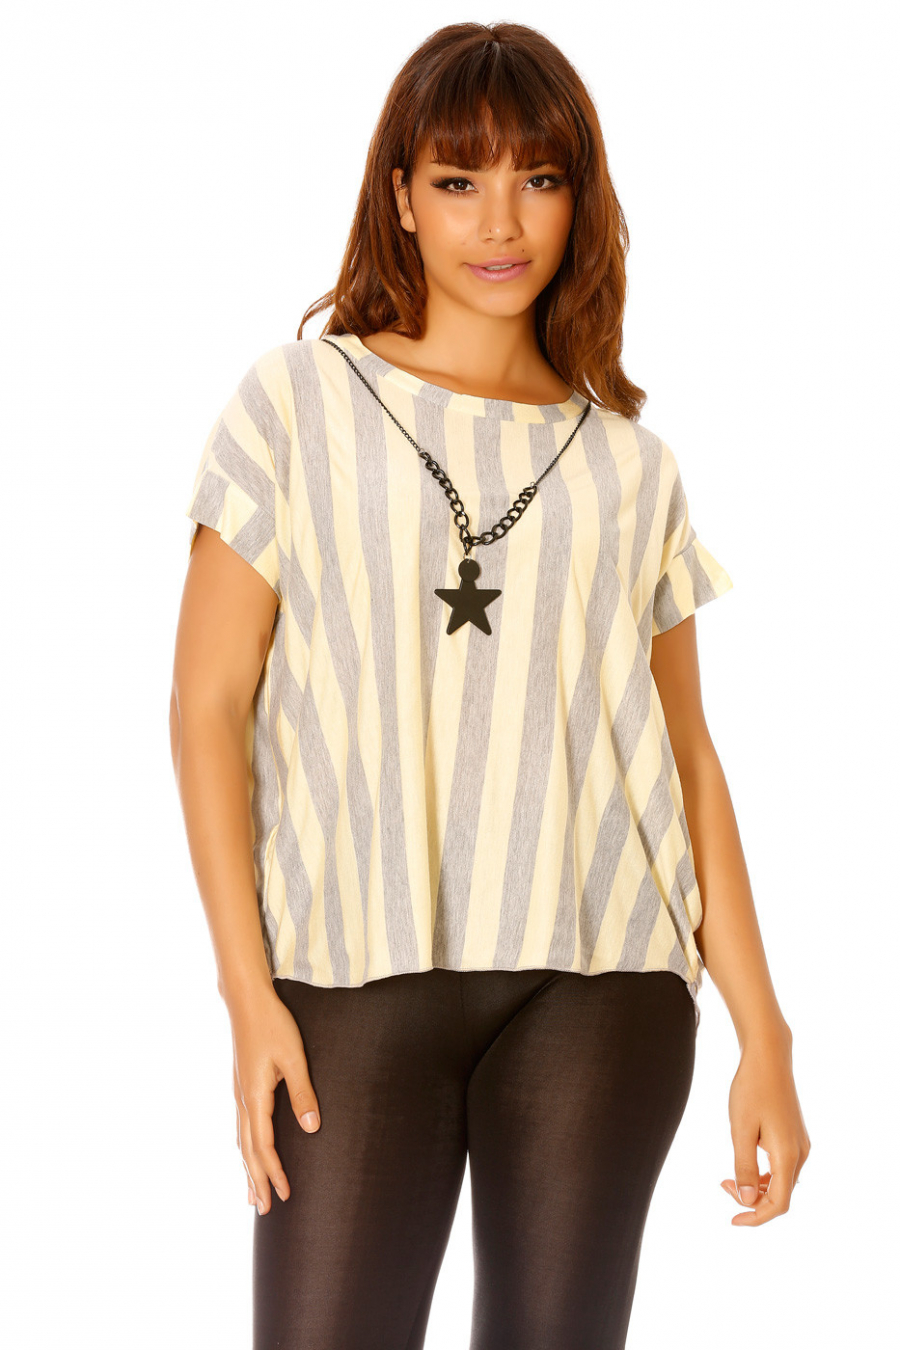 Tee-shirt rayé jaune, avec collier étoile. Femme MC 1722